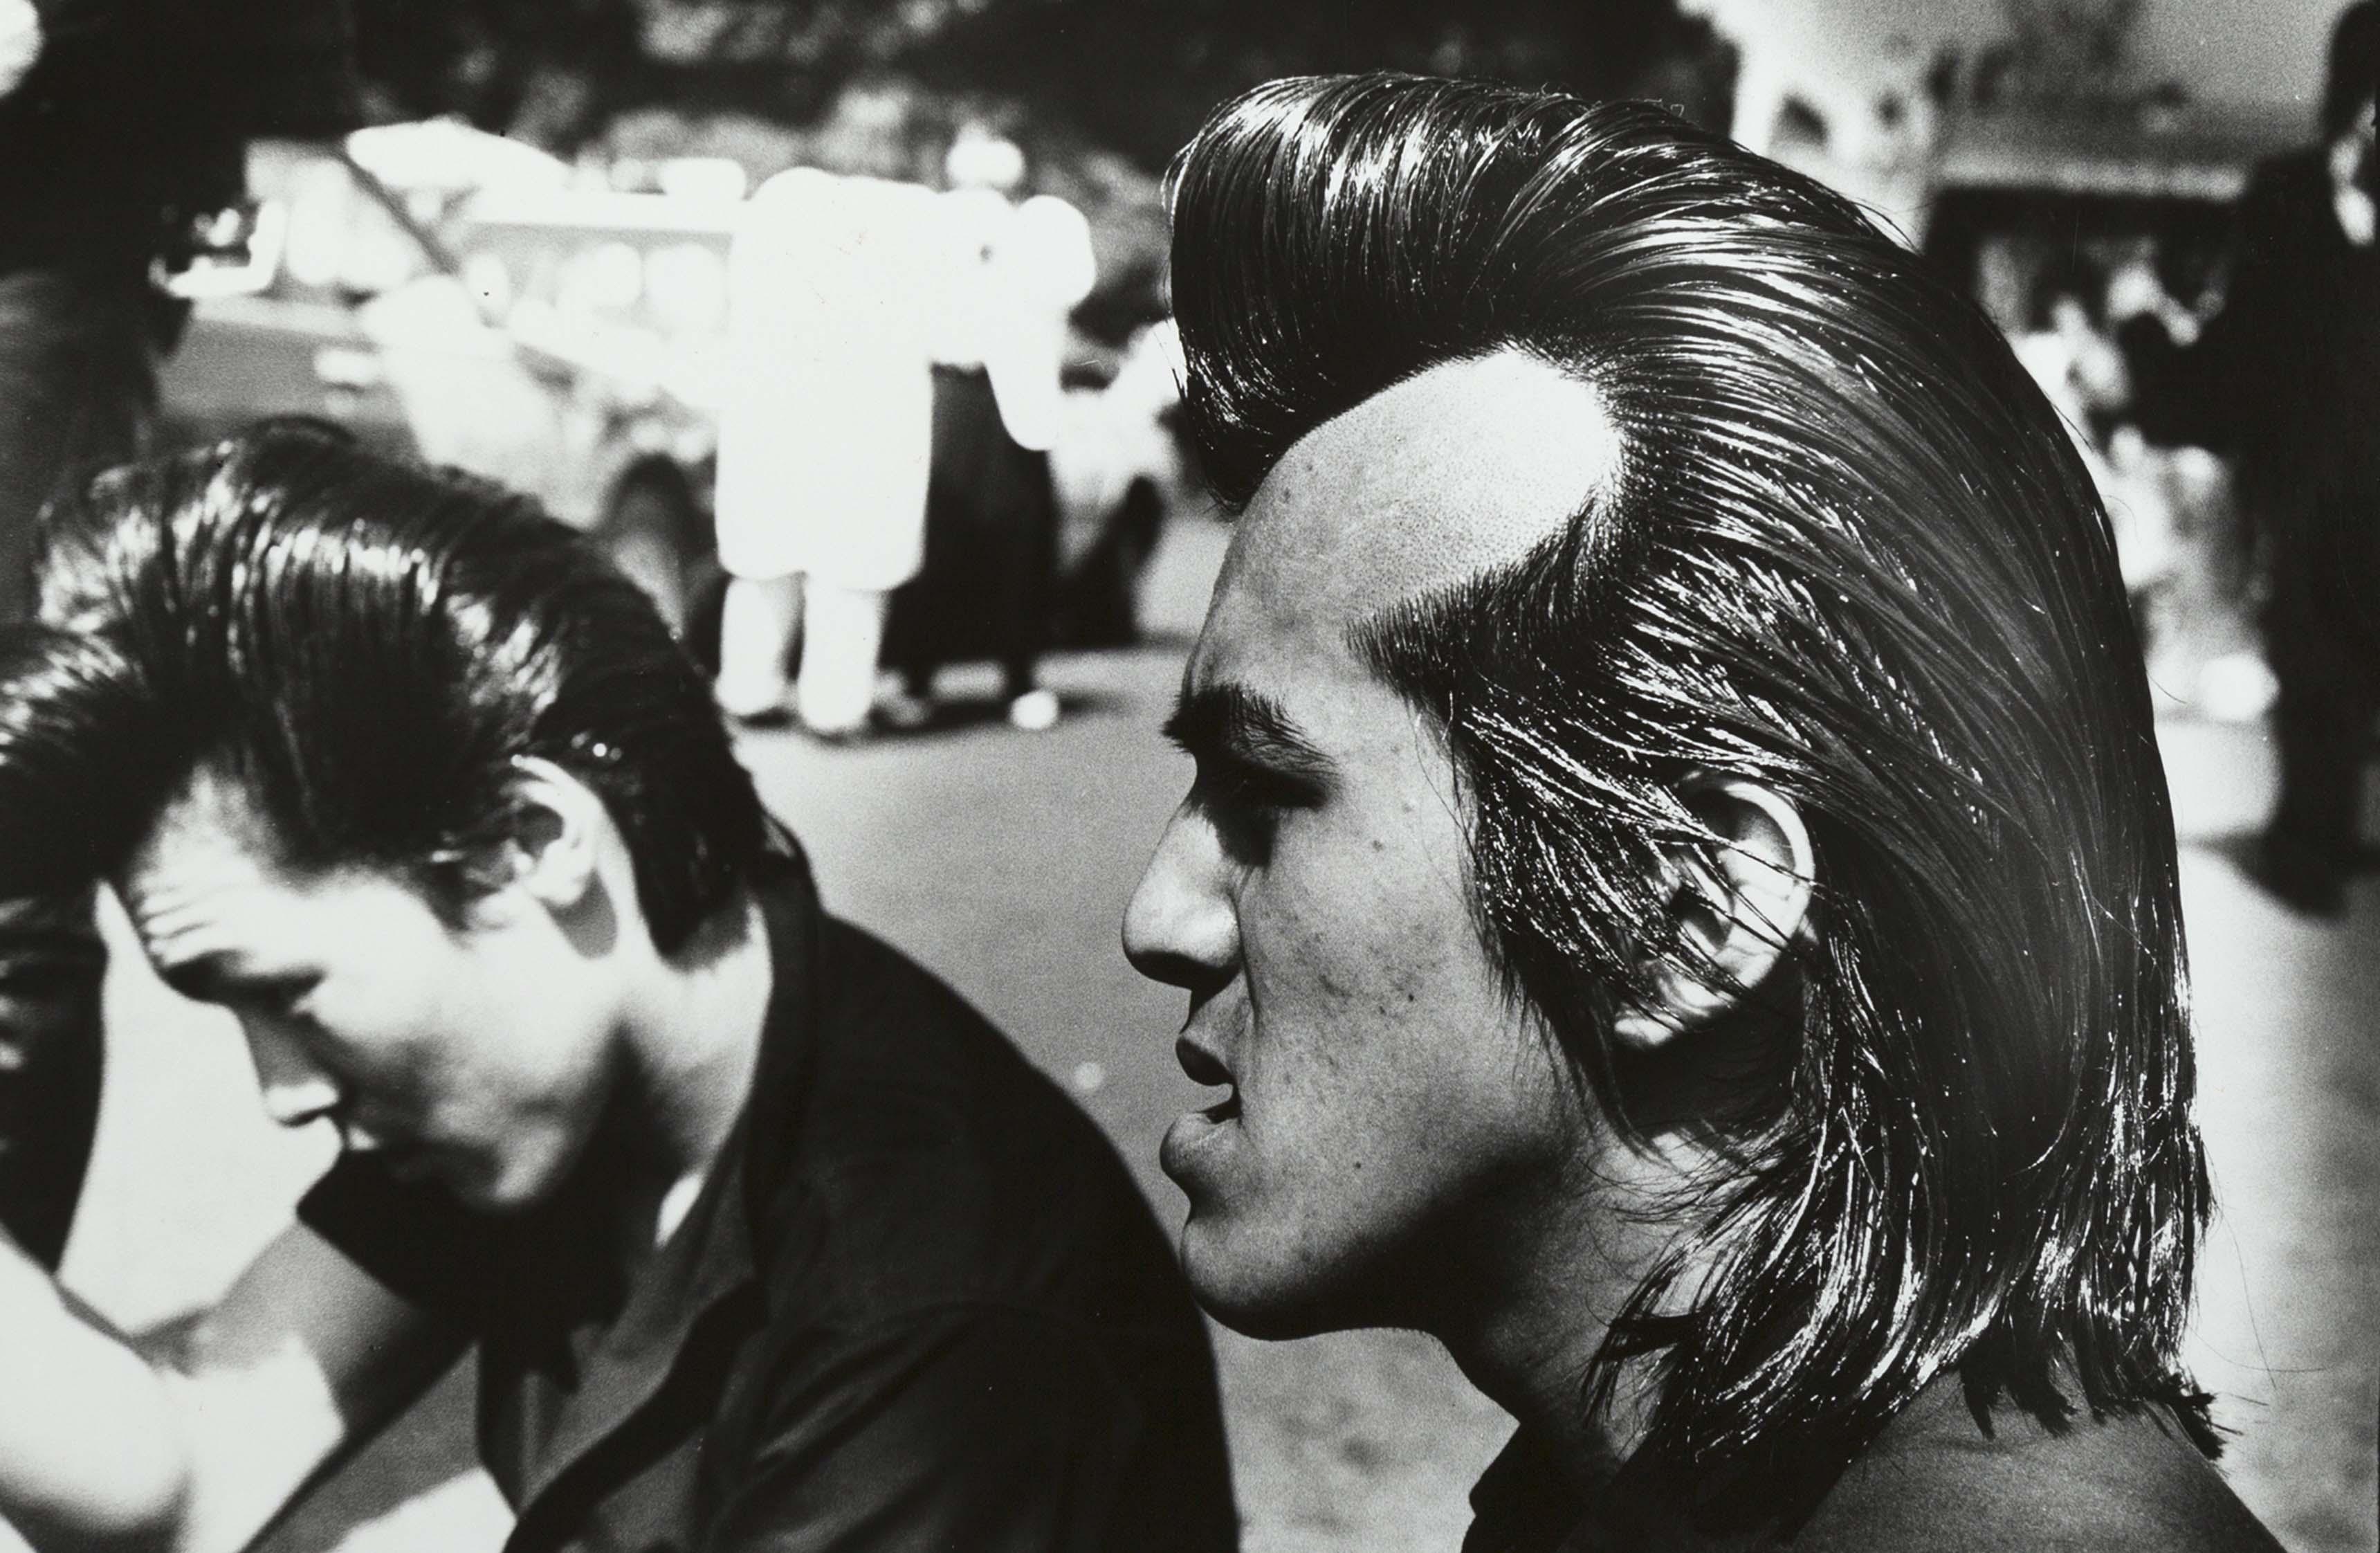 Ed van der Elsken, Rockers, Harajuku, Tokyo, 1984. Nederlands Fotomuseum Rotterdam © Ed van der Elsken / Ed van der Elsken Estate